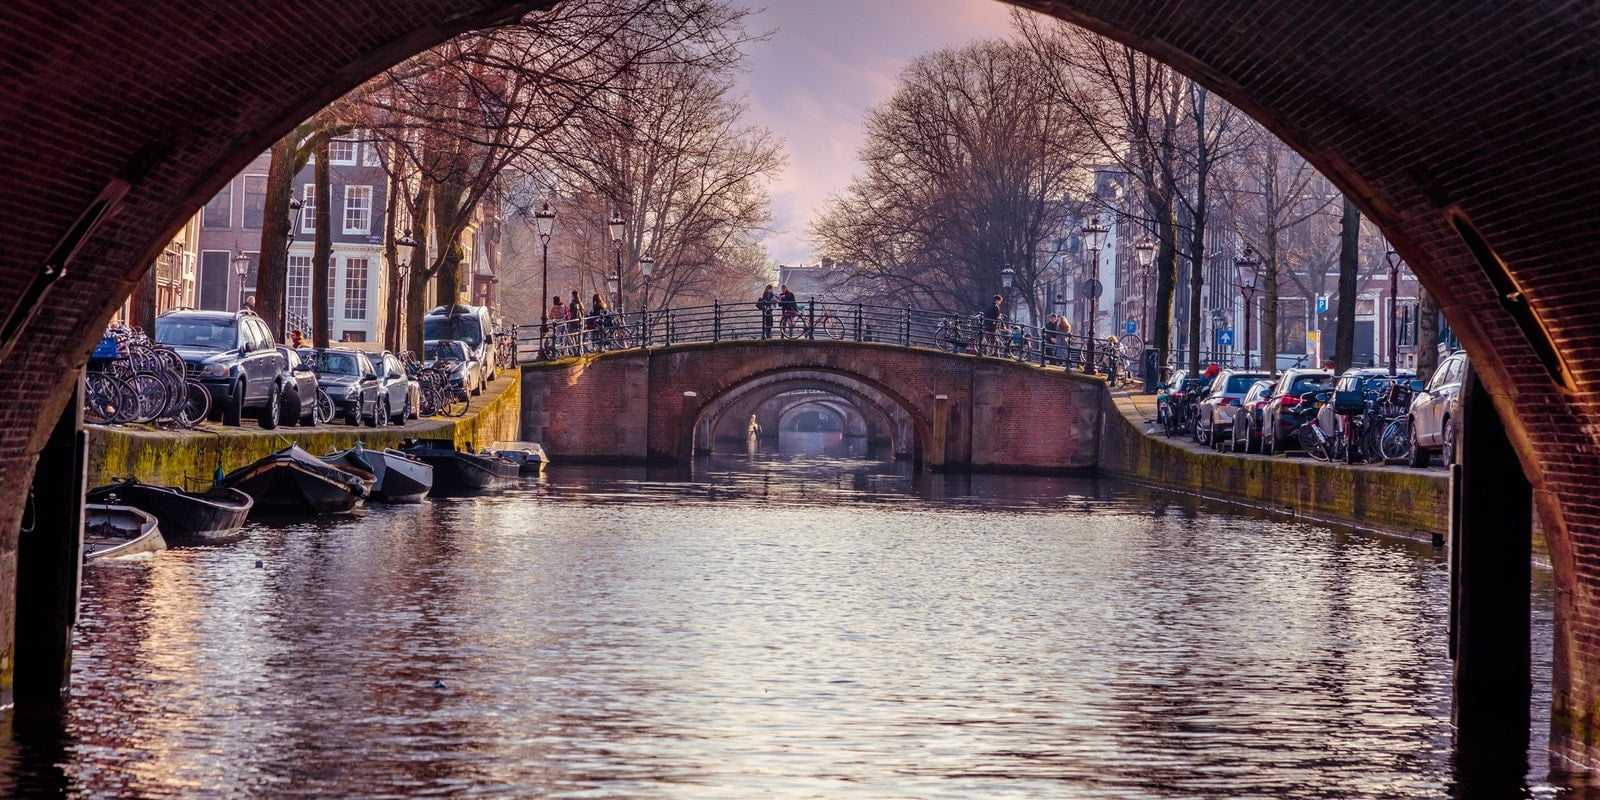 Amsterdamse bruggen om langs te varen